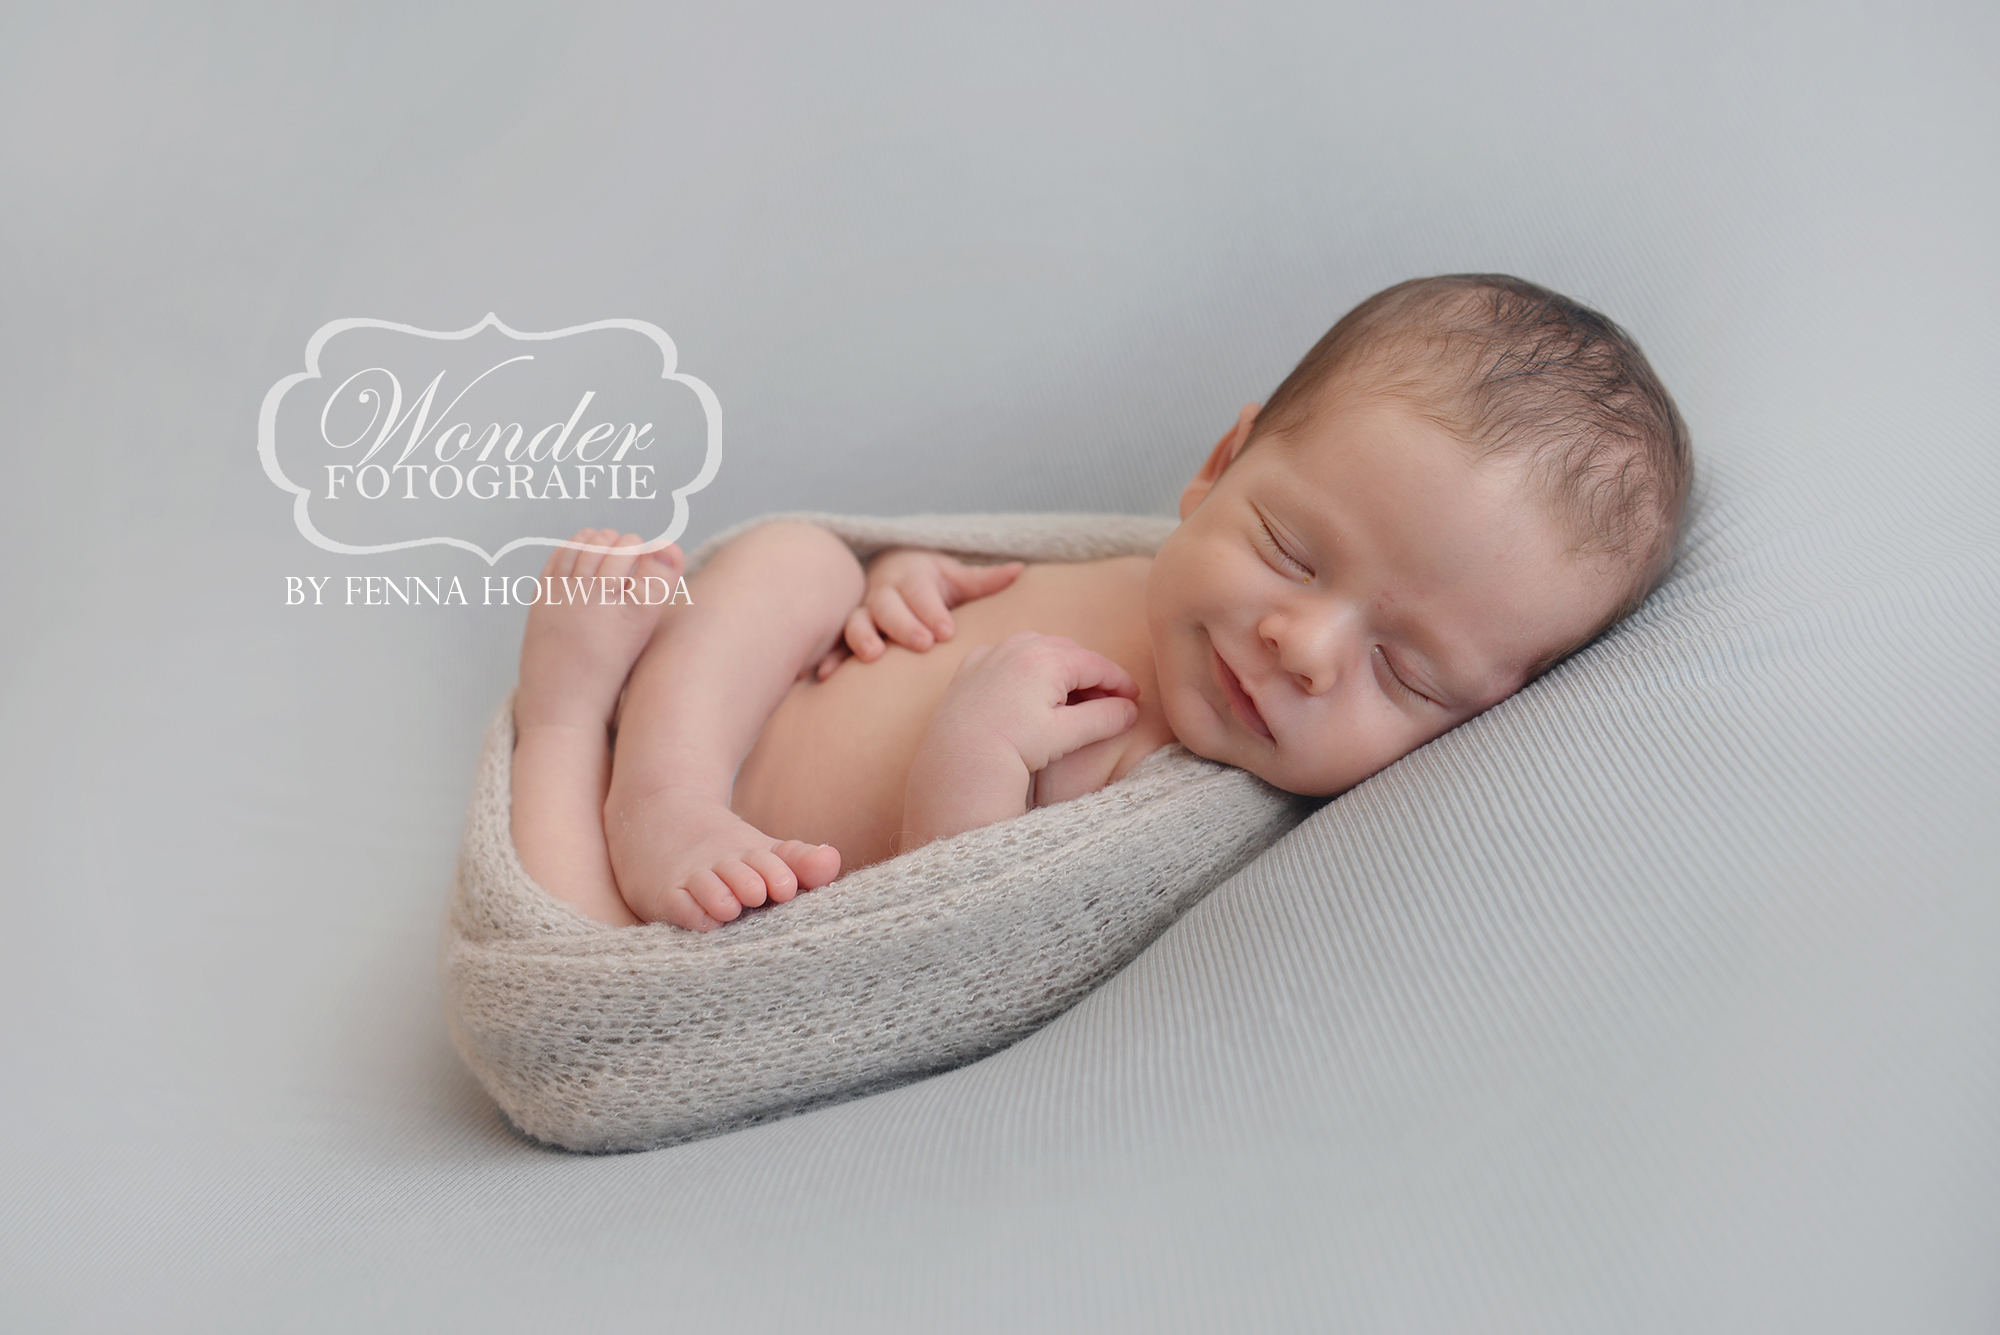 Fine Art Newborn Fotograaf Fenna Holwerda Fotoshoot Wonder Fotografie